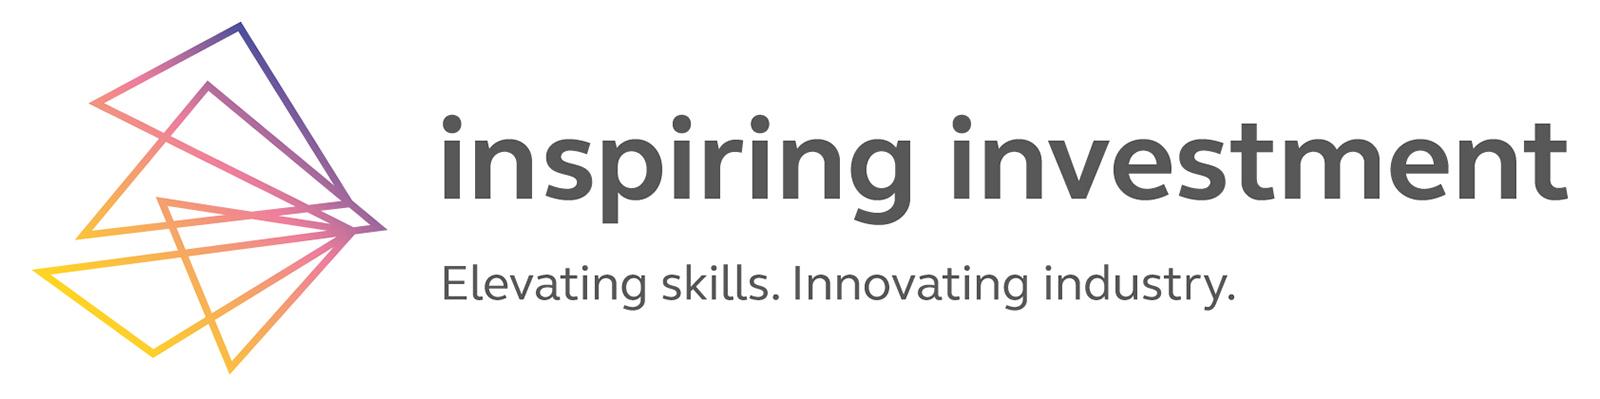 Inspiring Investment Logo_RGB_1600.jpg